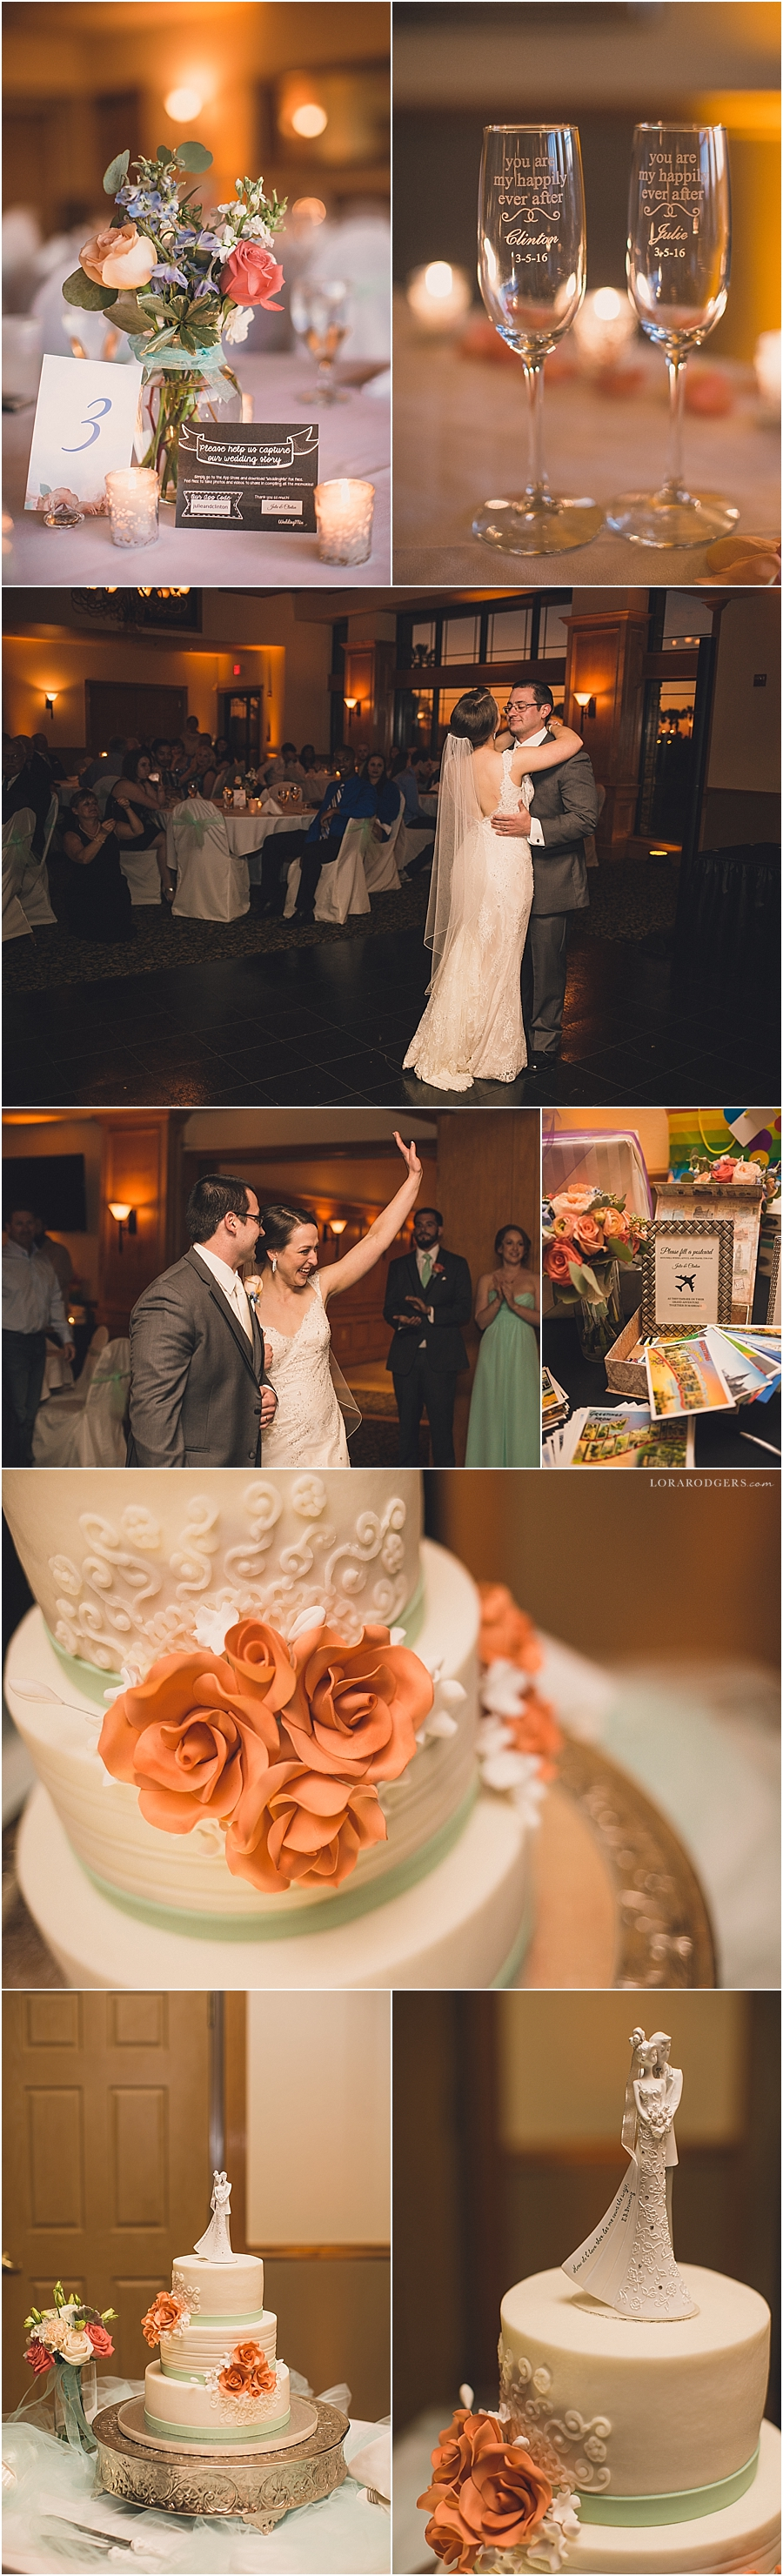 Stoneybrook_West_Orlando_Florida_Wedding_013